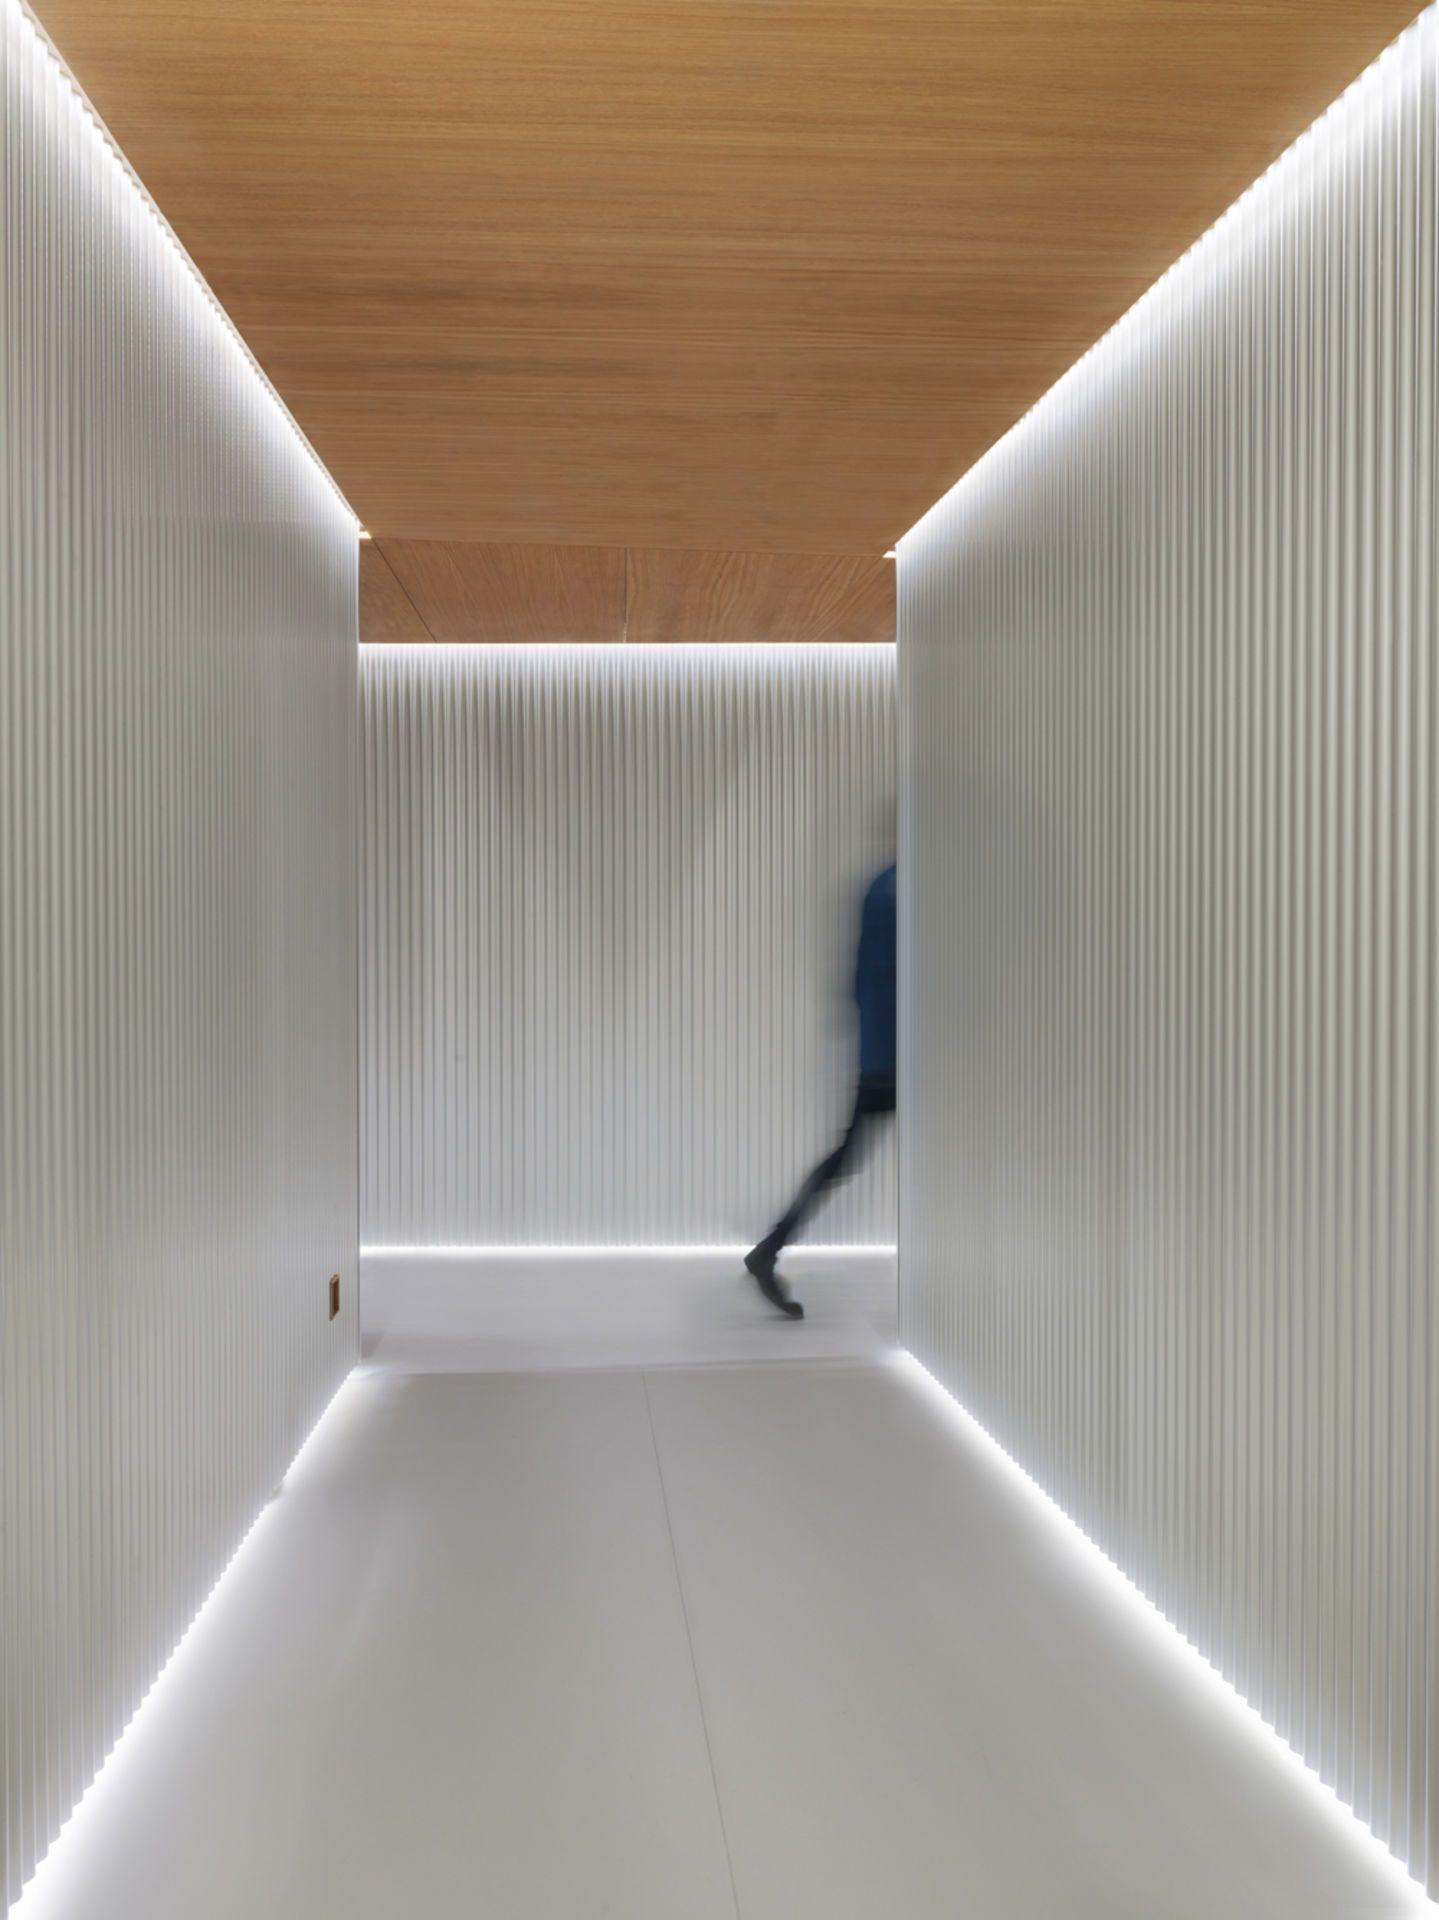 Hospital Corridor Lighting Design: Ralph Germann · Entourage Clinic · Divisare